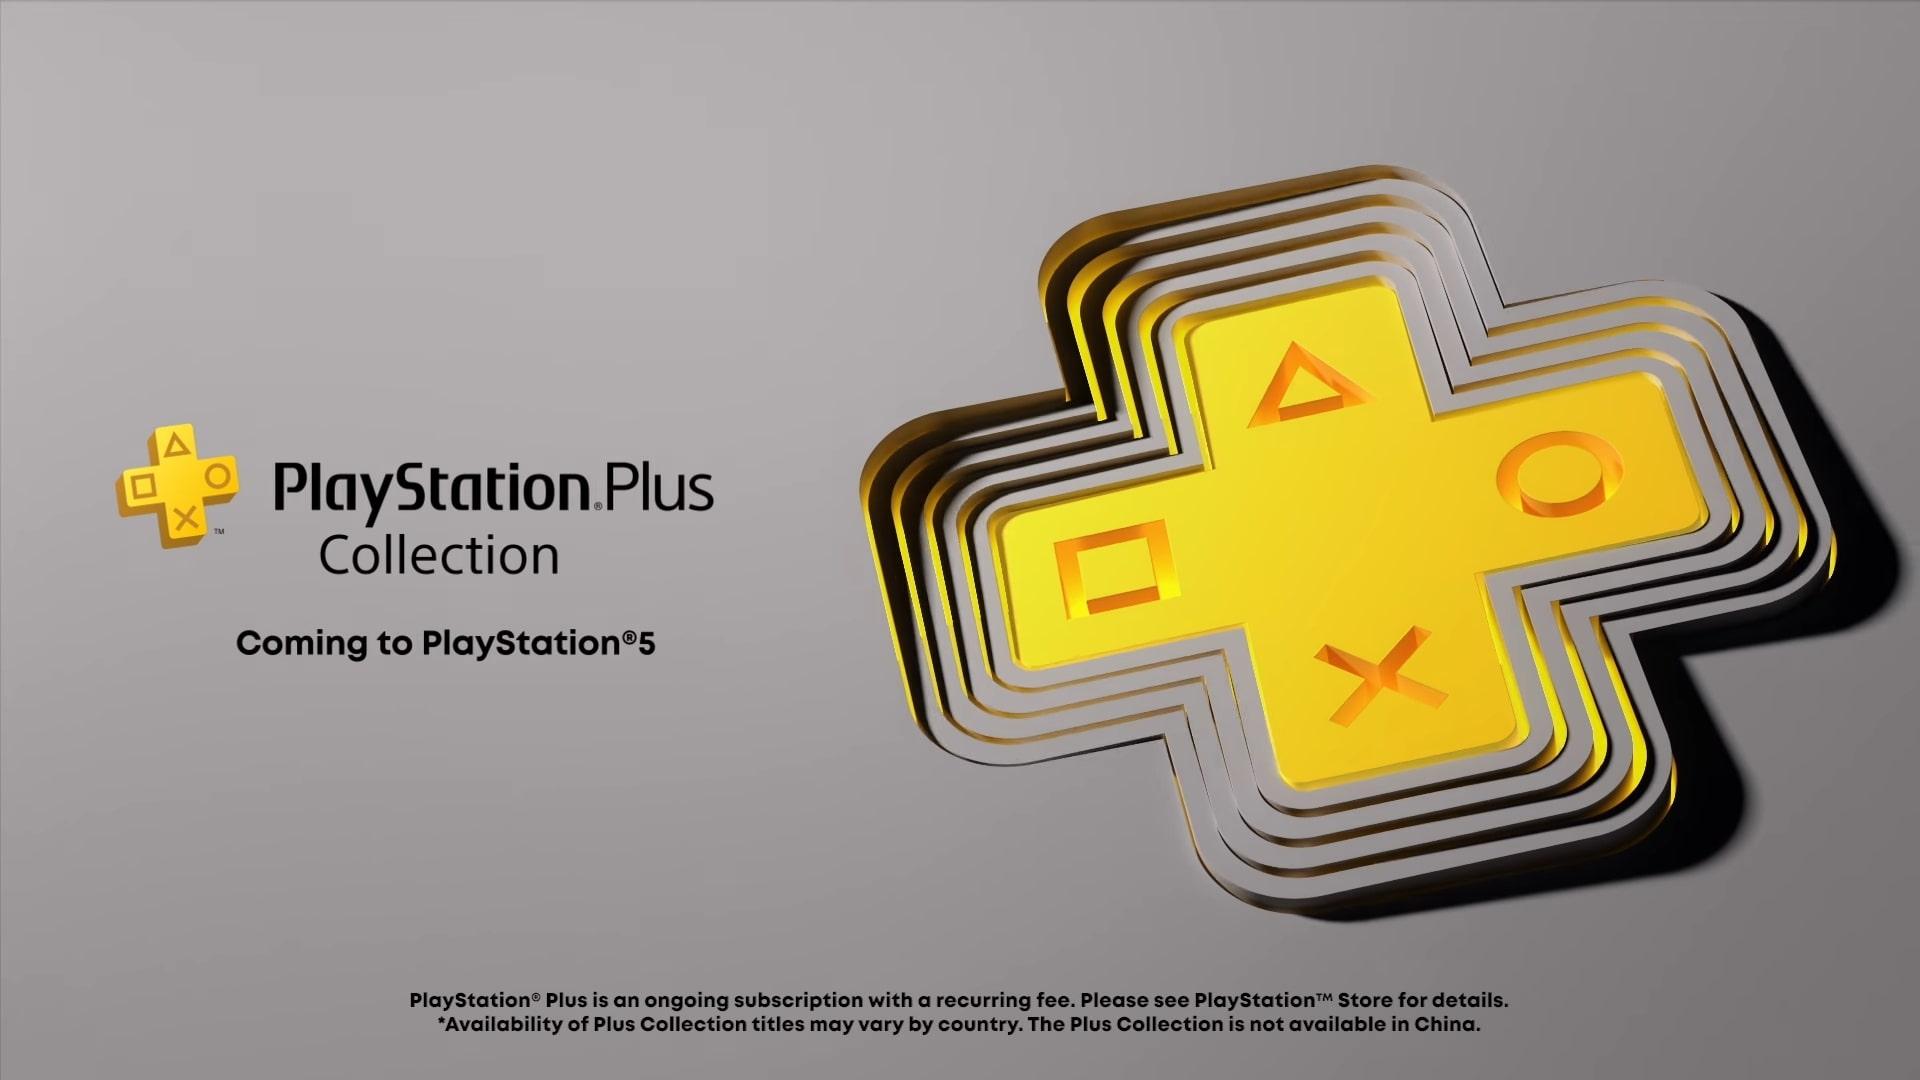 Jogos disponíveis no PlayStation Plus Collection